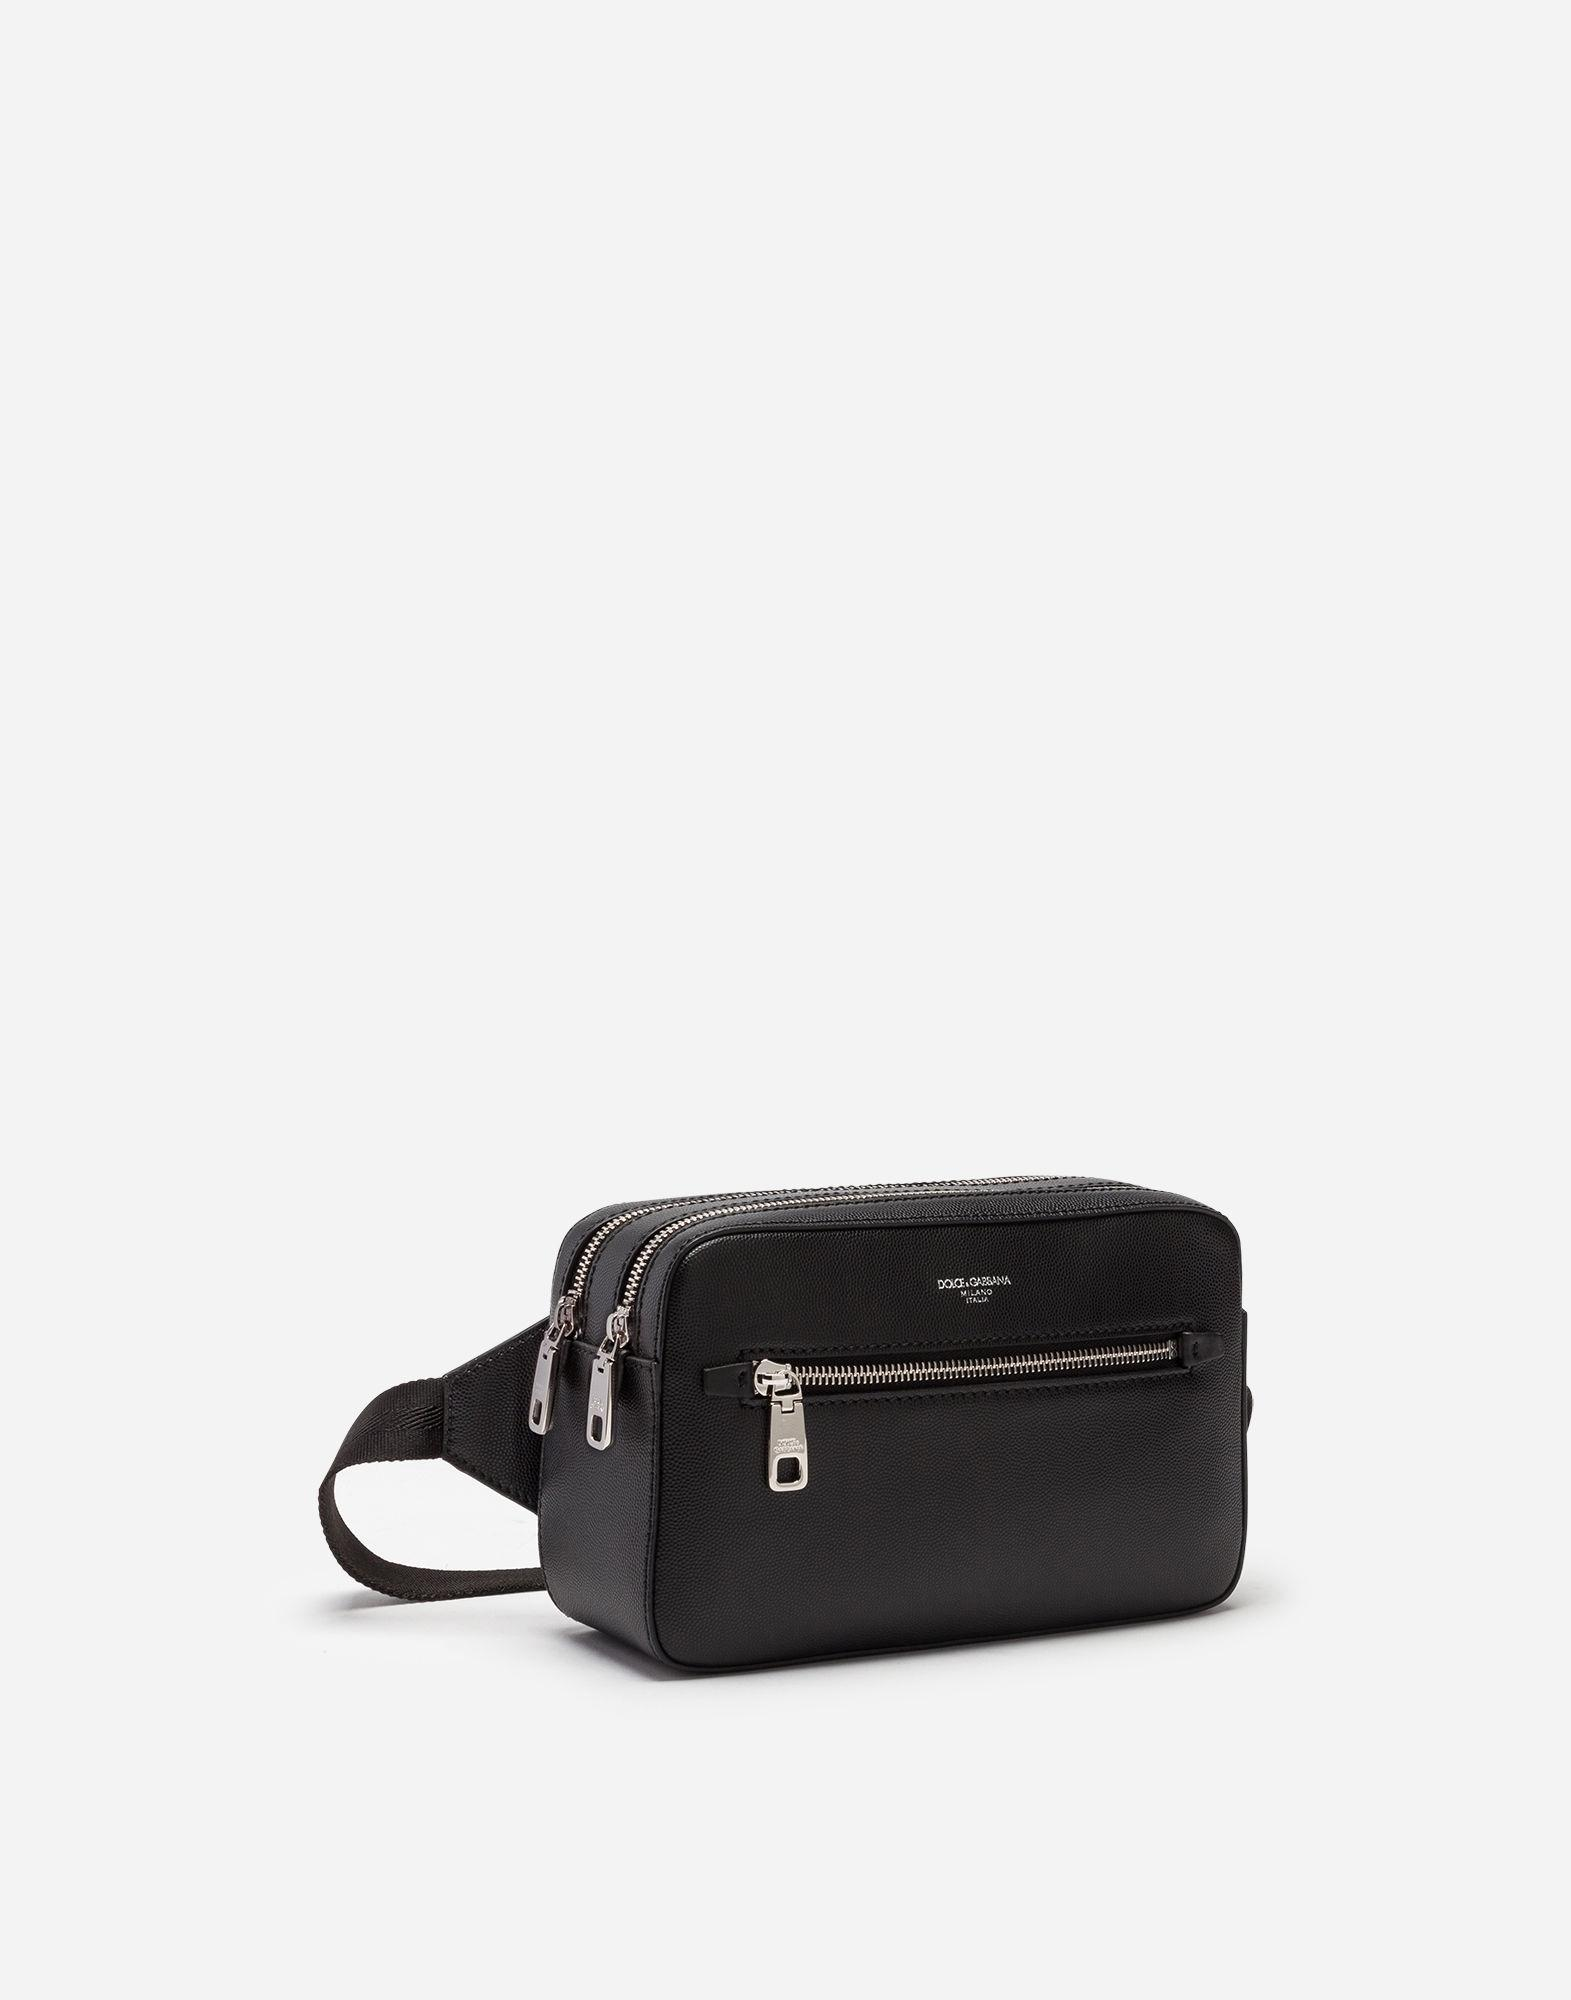 Lyst - Dolce   Gabbana Gothic Pouch In Calfskin in Black for Men d7e2c65122c2b